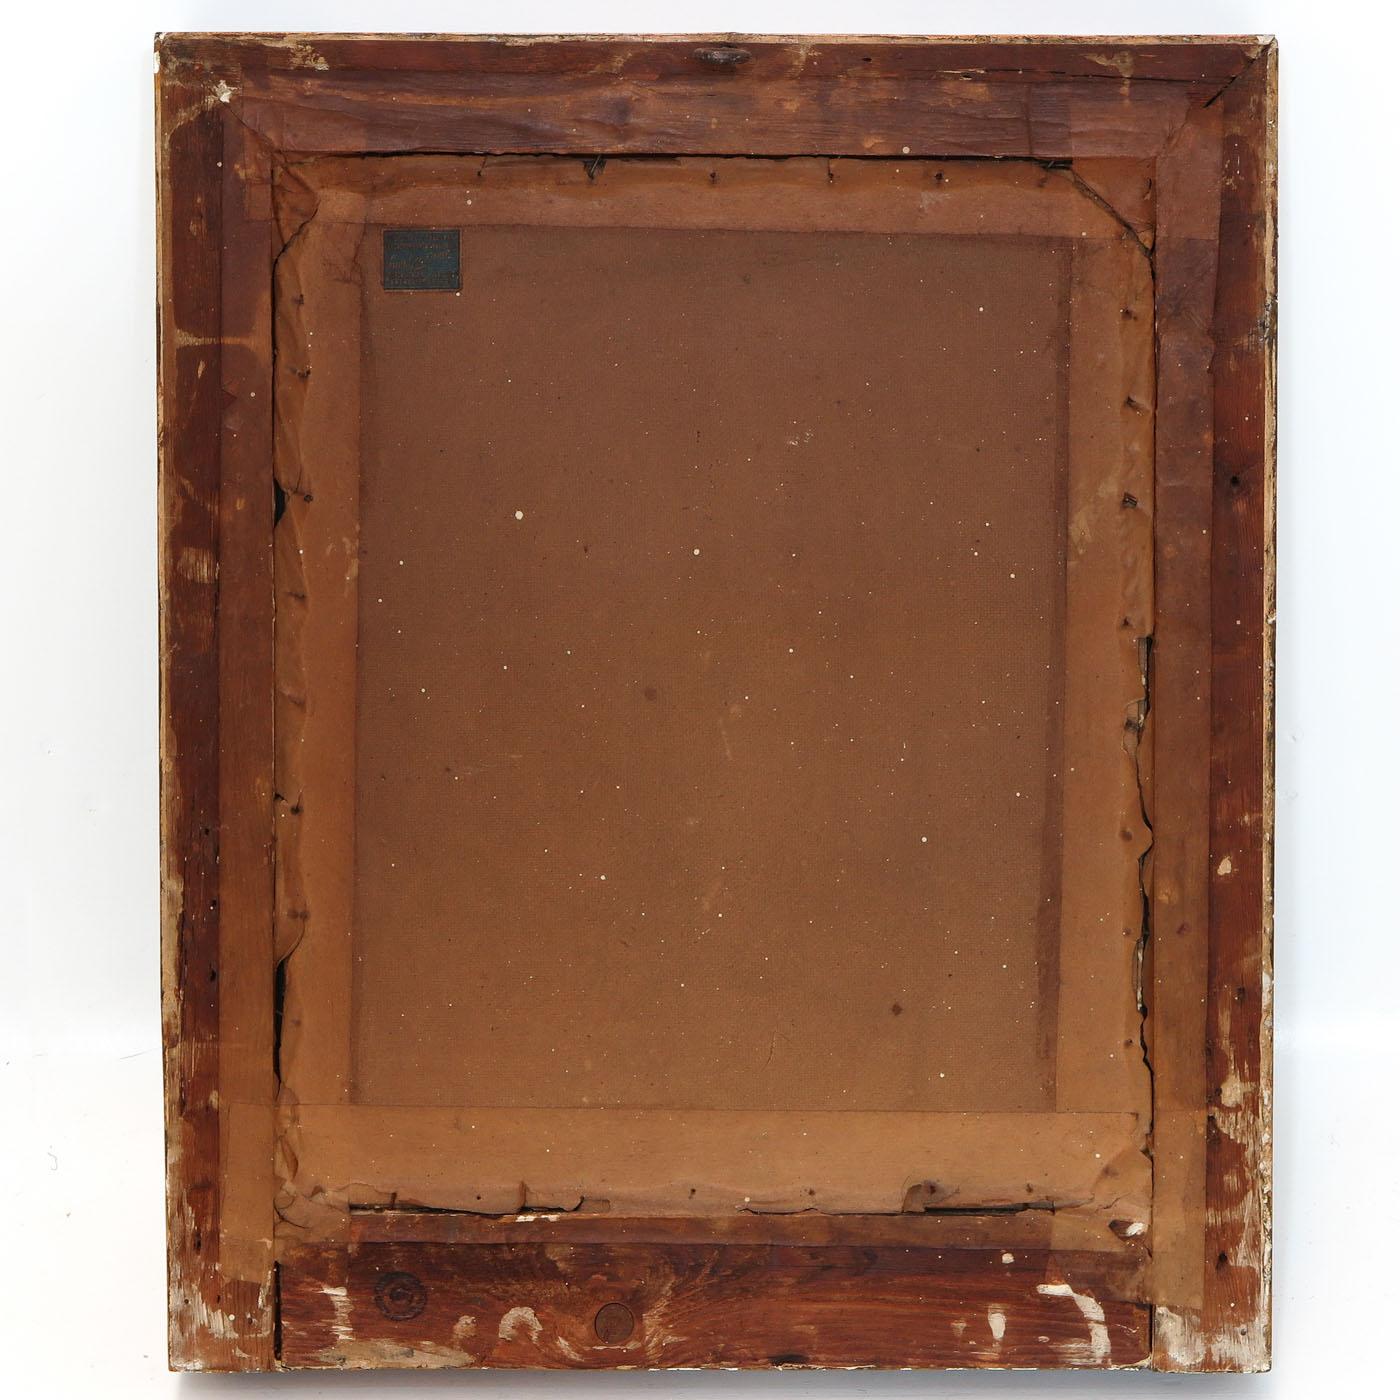 Lot 1179 - A Religious Framed Work